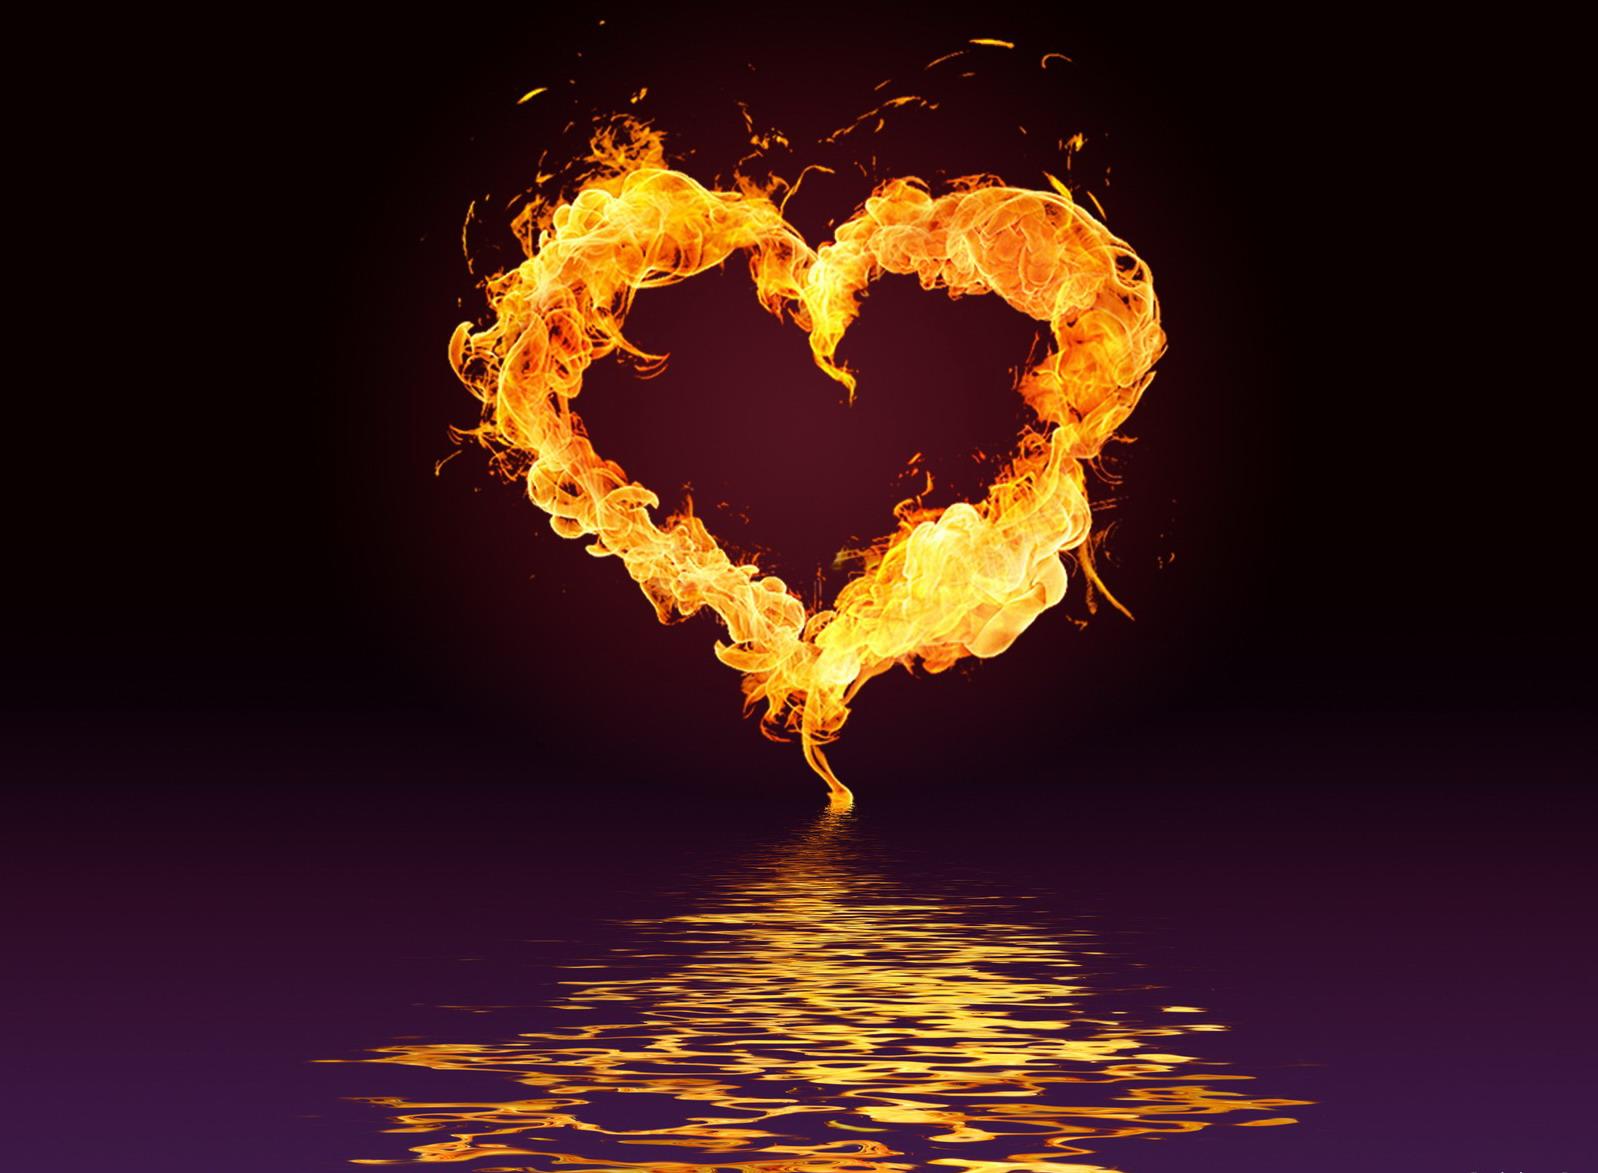 صور شعر رومانسي 2017 ,صور شعر حب 2018 , عبارات رومانسية, , رومانسي , رومانسية , عبارات صور شعر رومان 2015_1418574529_595.